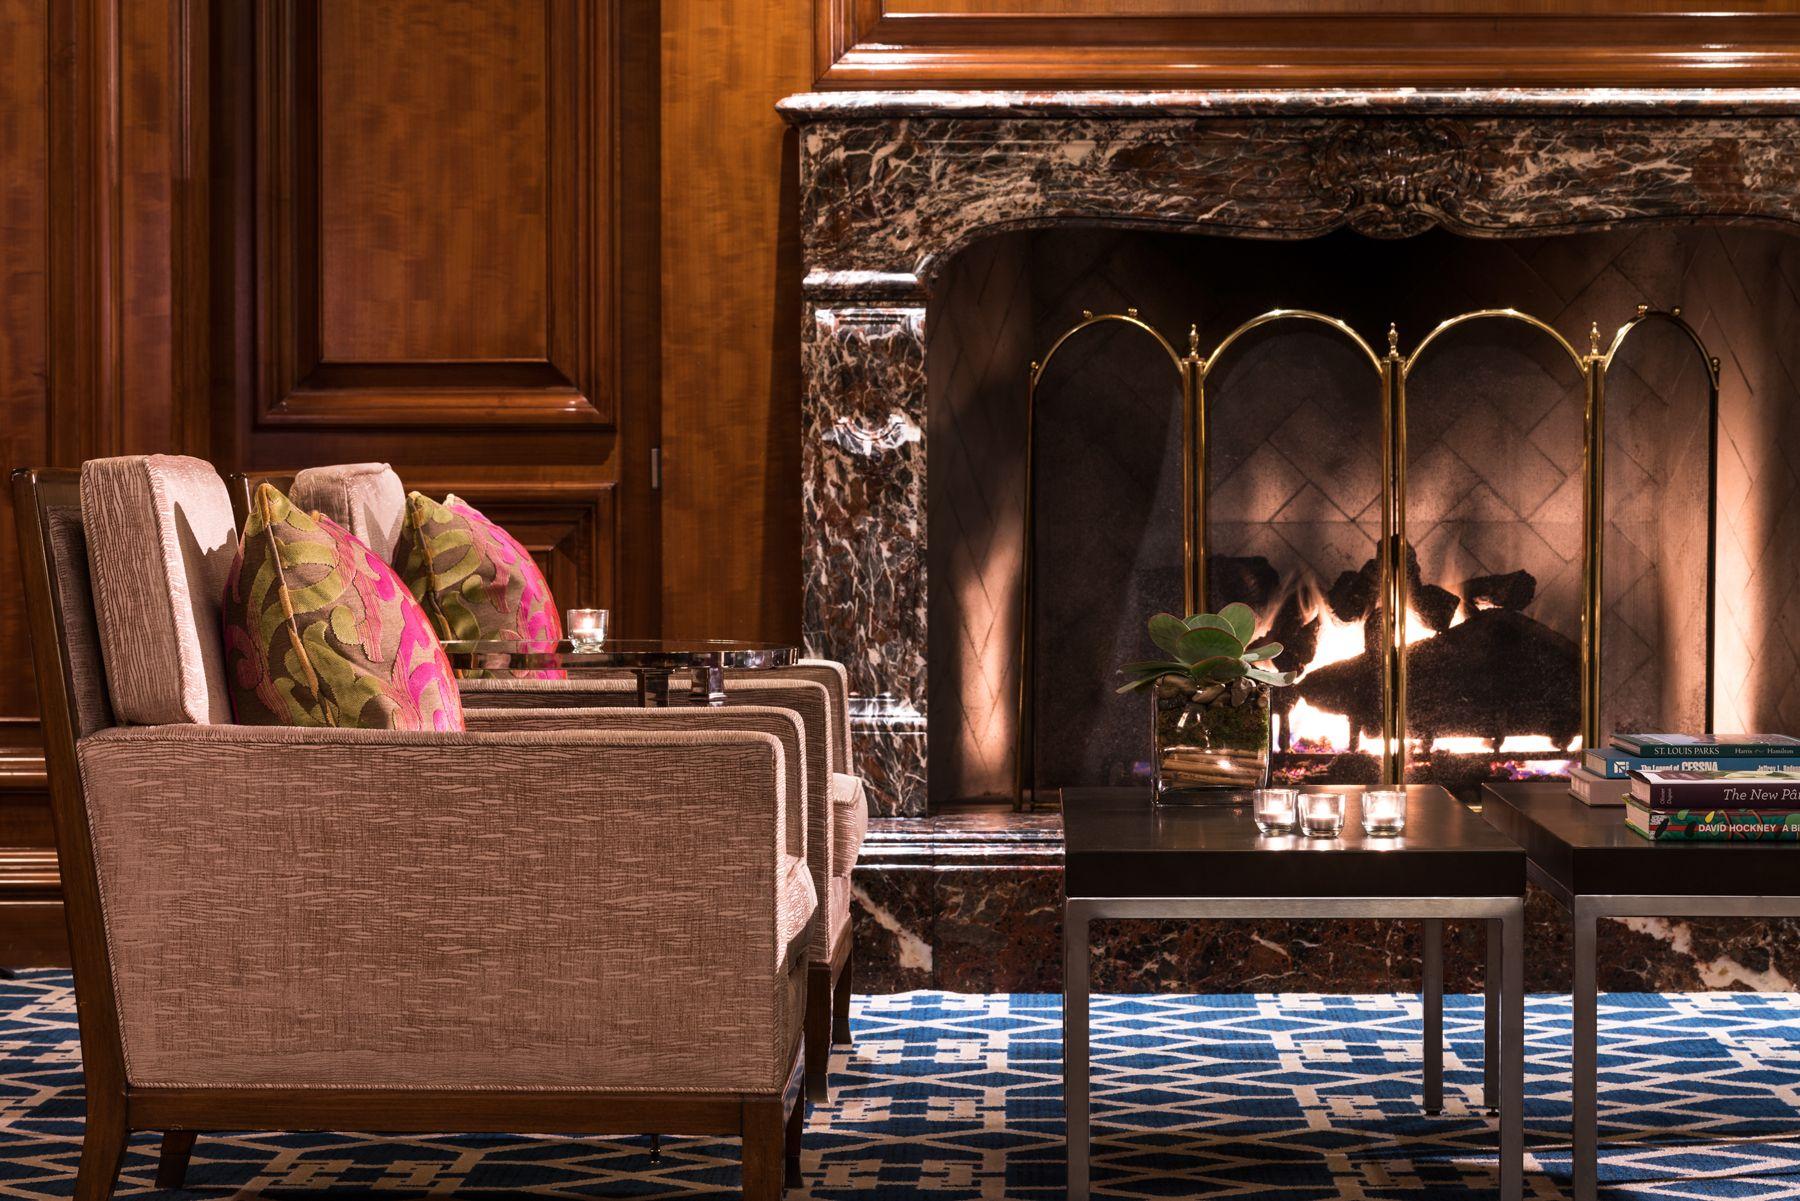 rcstl_fireplace_dtl_1.jpg